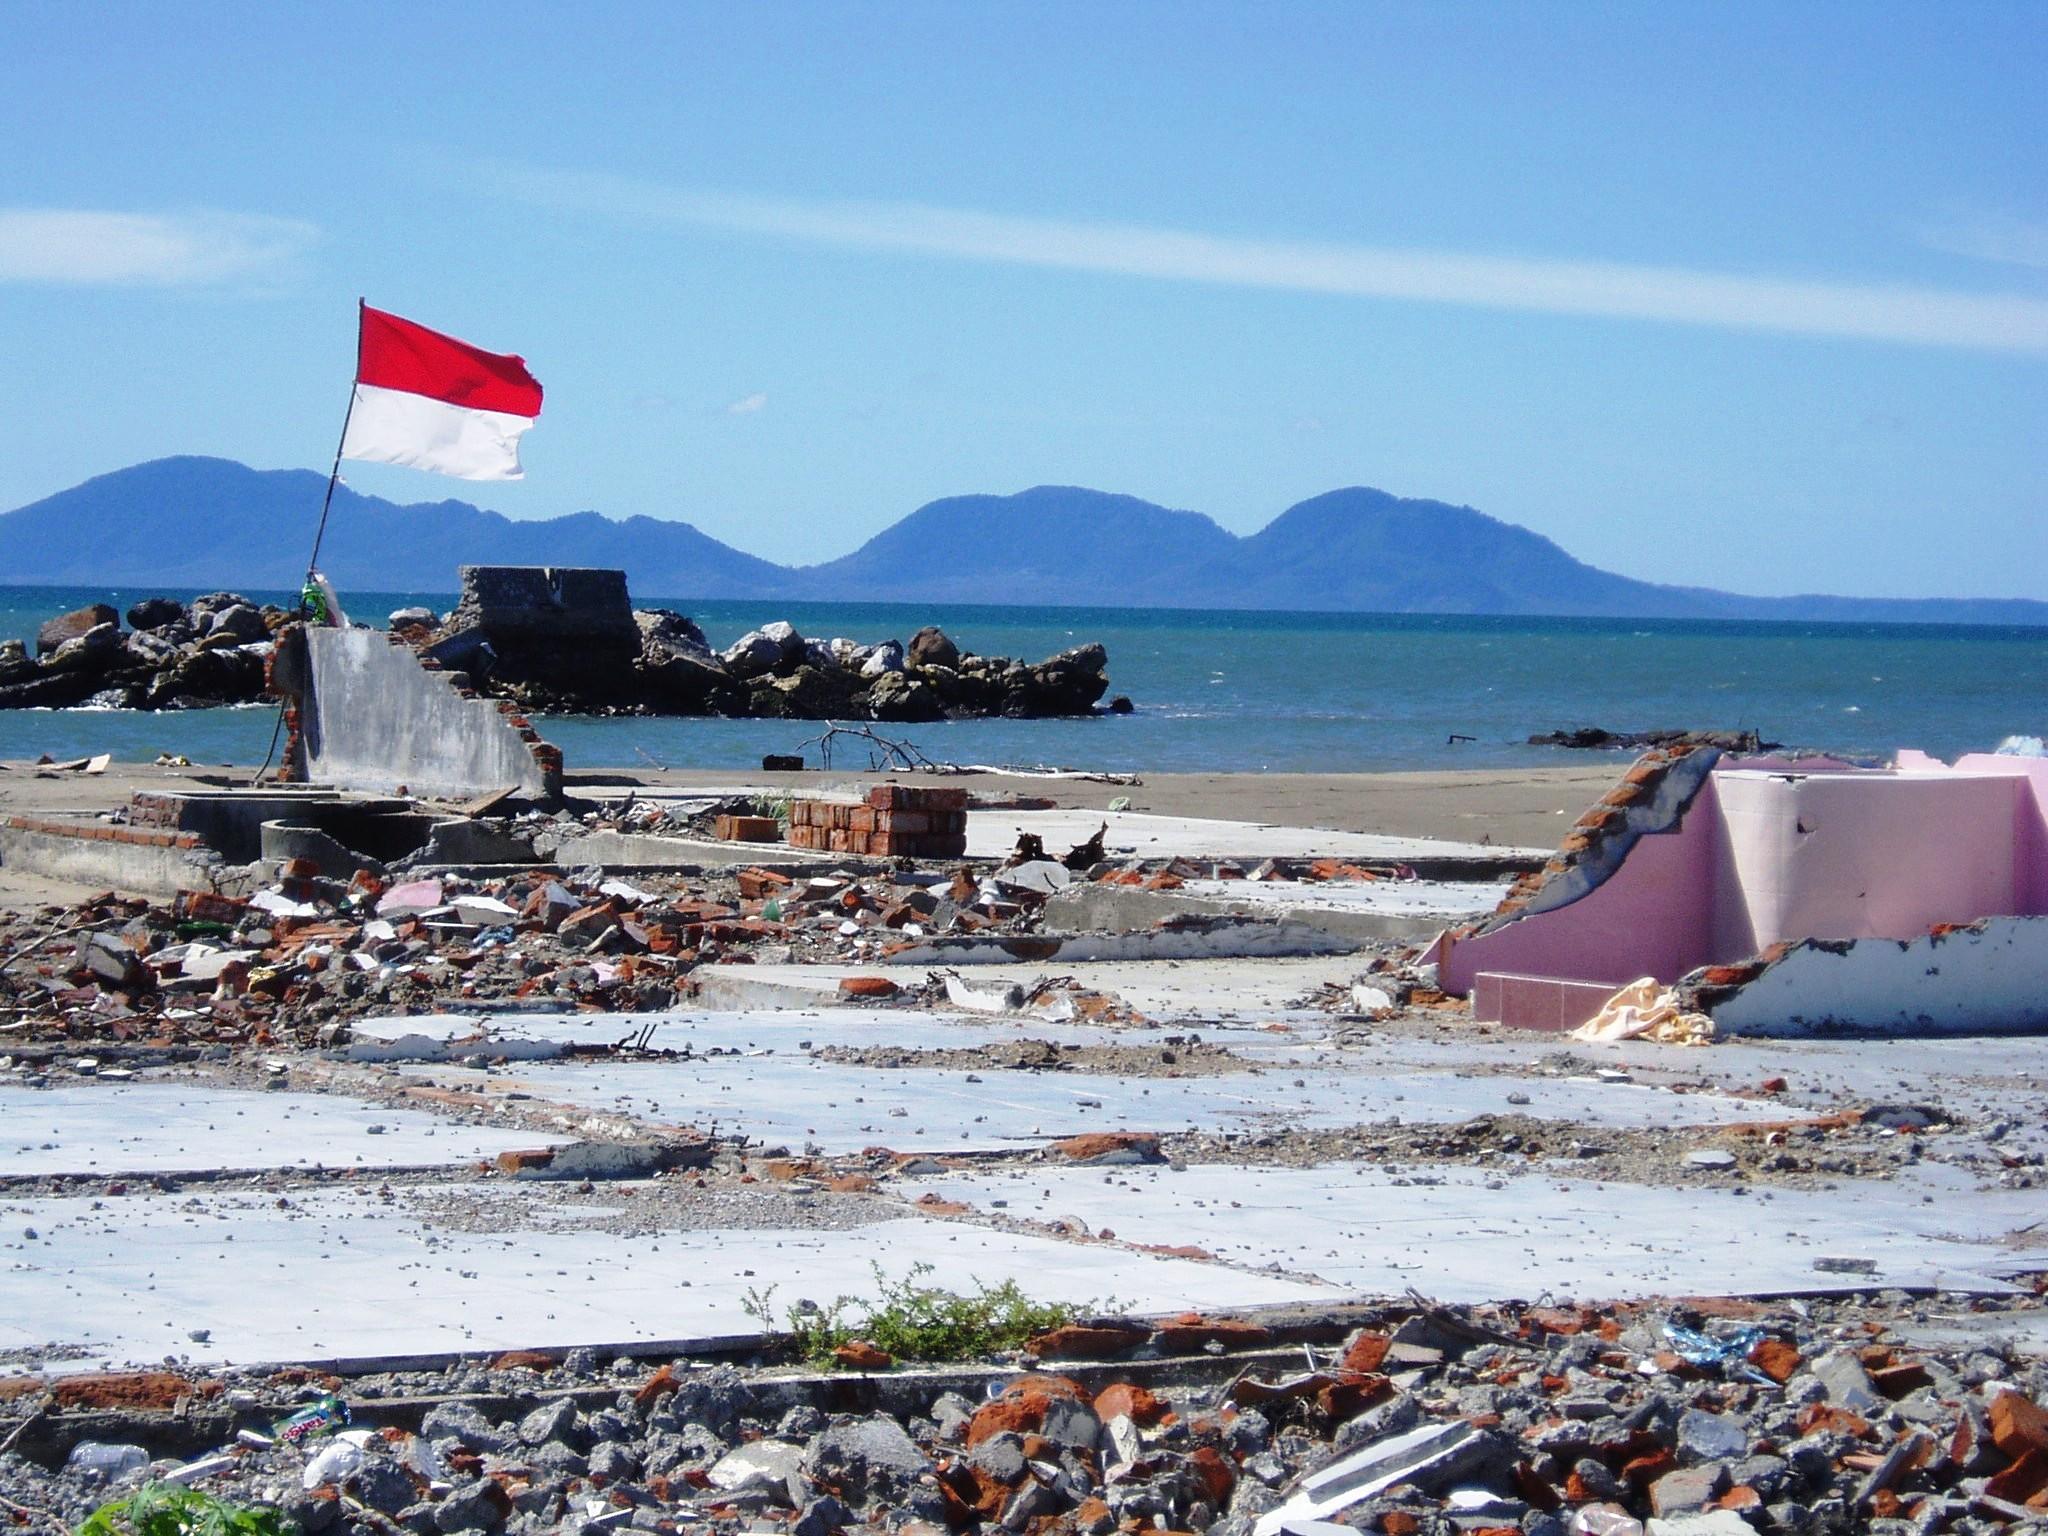 December-26-blog-banner_pic-of-devastation-with-Indonesian-flag.jpg